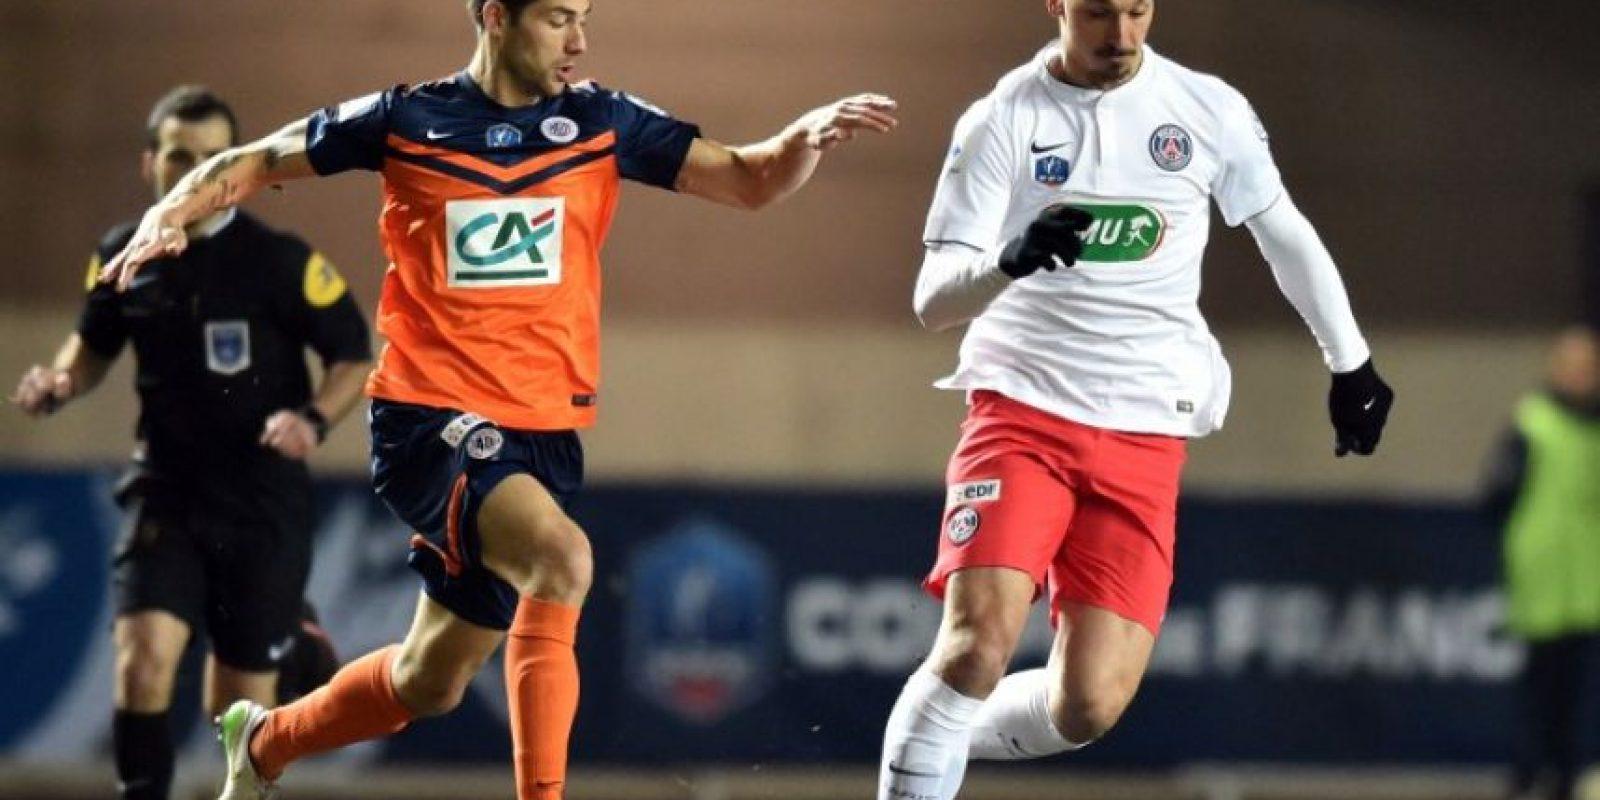 Se trata de Zlatan Ibrahimovic Foto:AFP